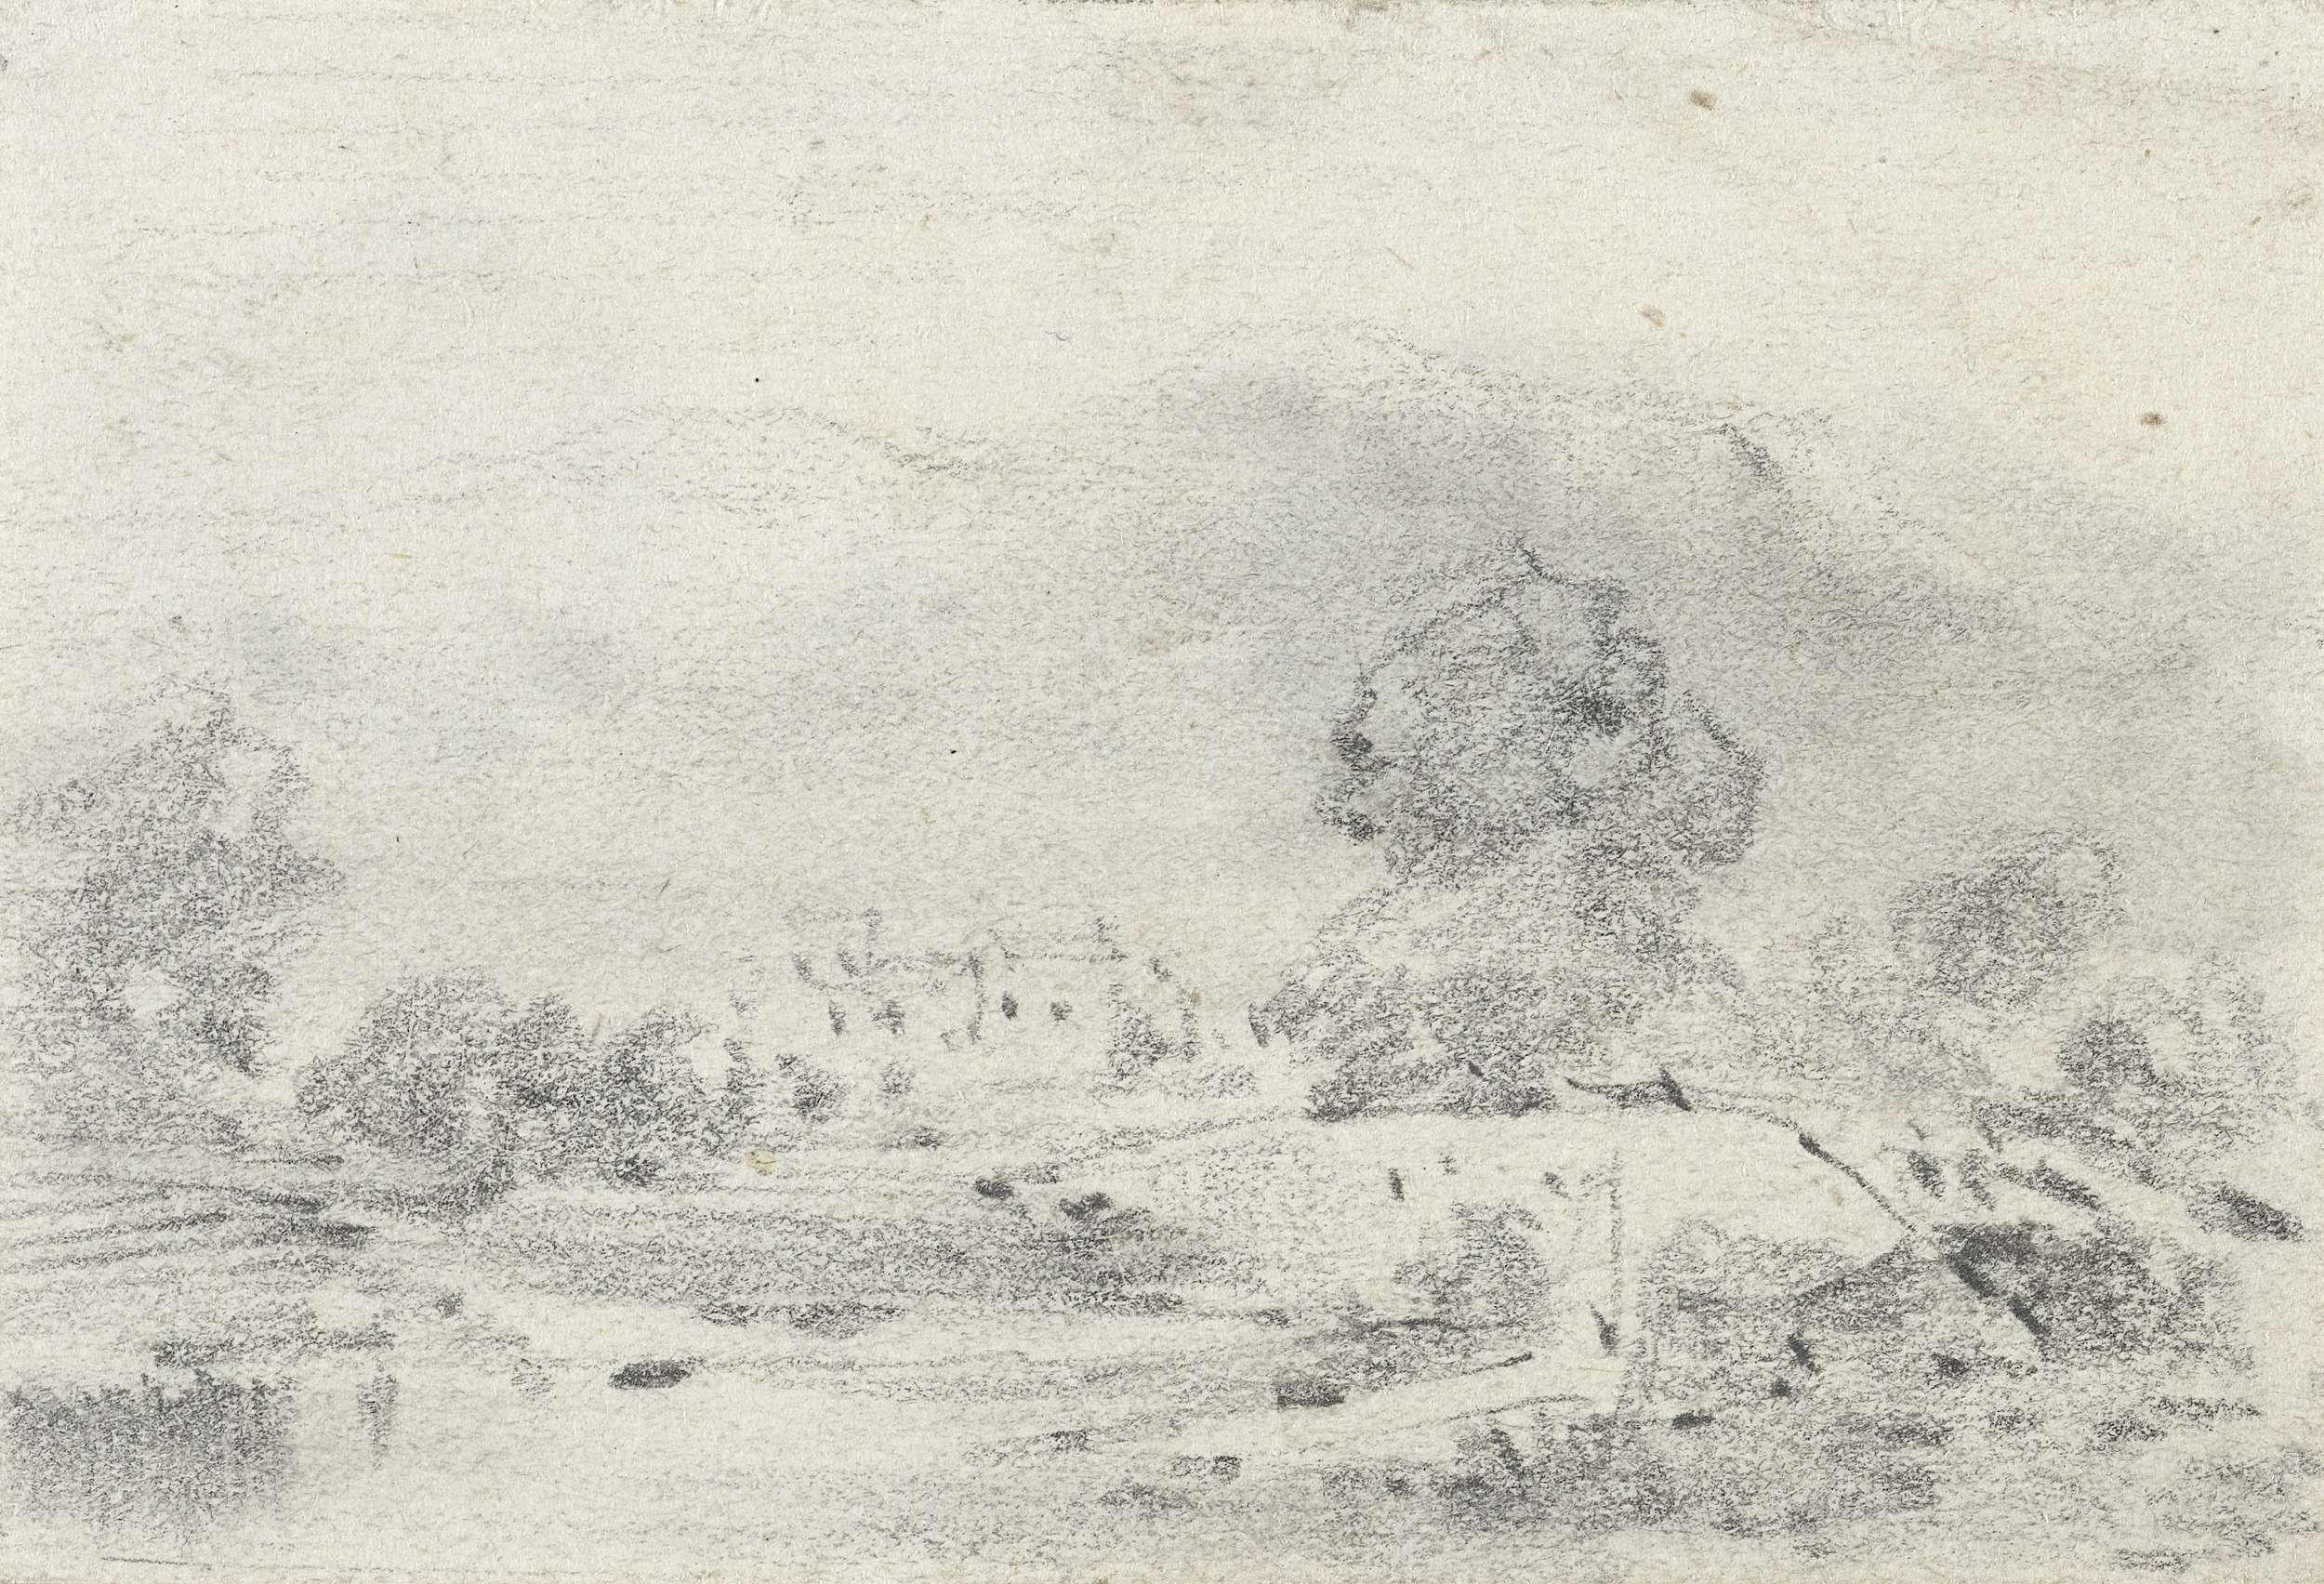 Maxime François Antoine Lalanne | Landschap met brug, Maxime François Antoine Lalanne, 1837 - 1886 |